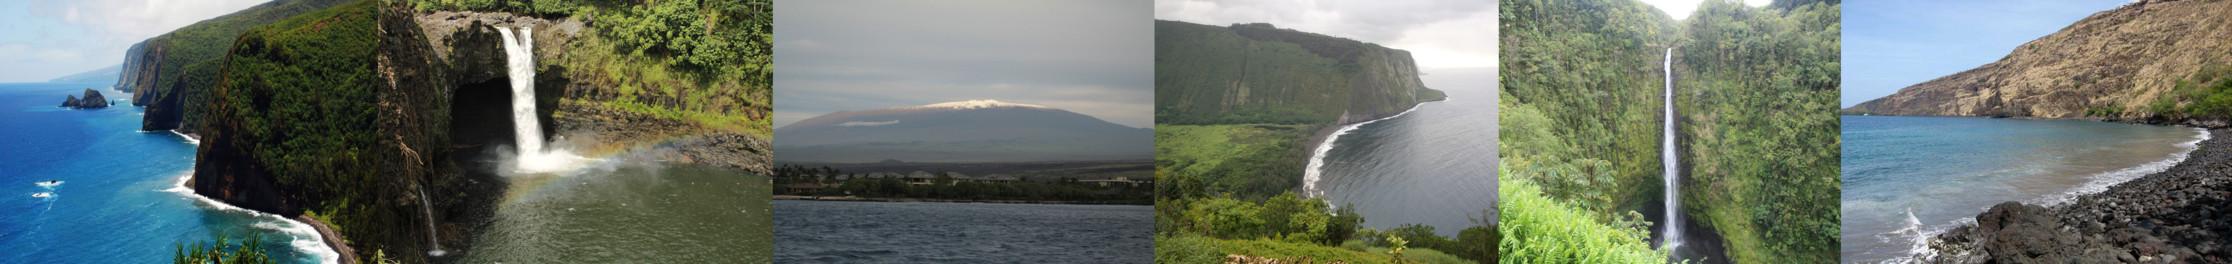 Six locations were used with 30-50 images for each. From left to right: Pololu Valley, Rainbow Falls, Mauna Kea, Waipi'o Valley, Akaka Falls, Kealakekua Bay